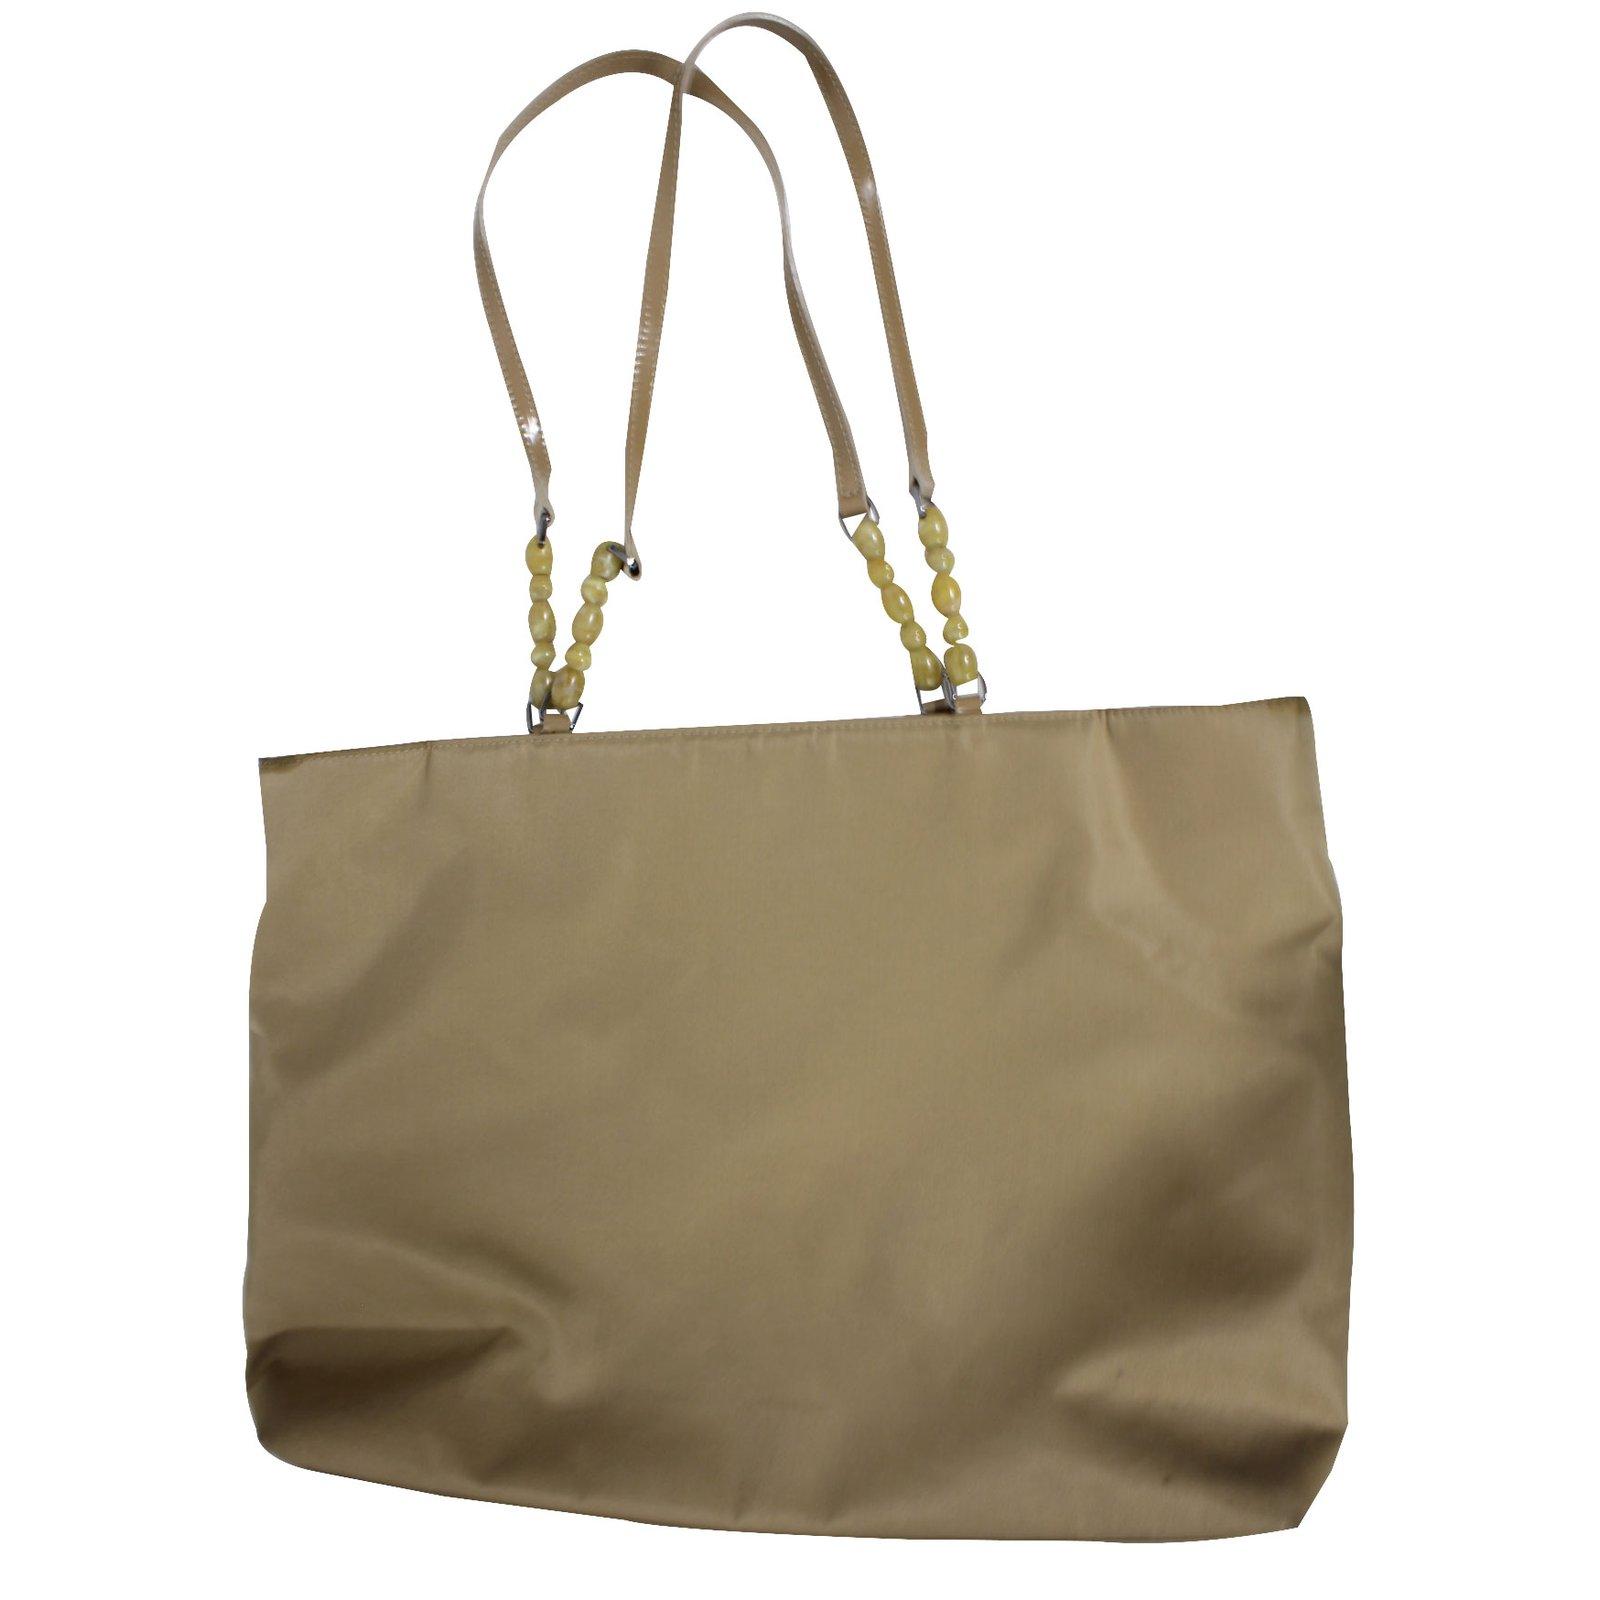 60554eadd44 Christian Dior Tote bag Totes Cloth Beige ref.22524 - Joli Closet